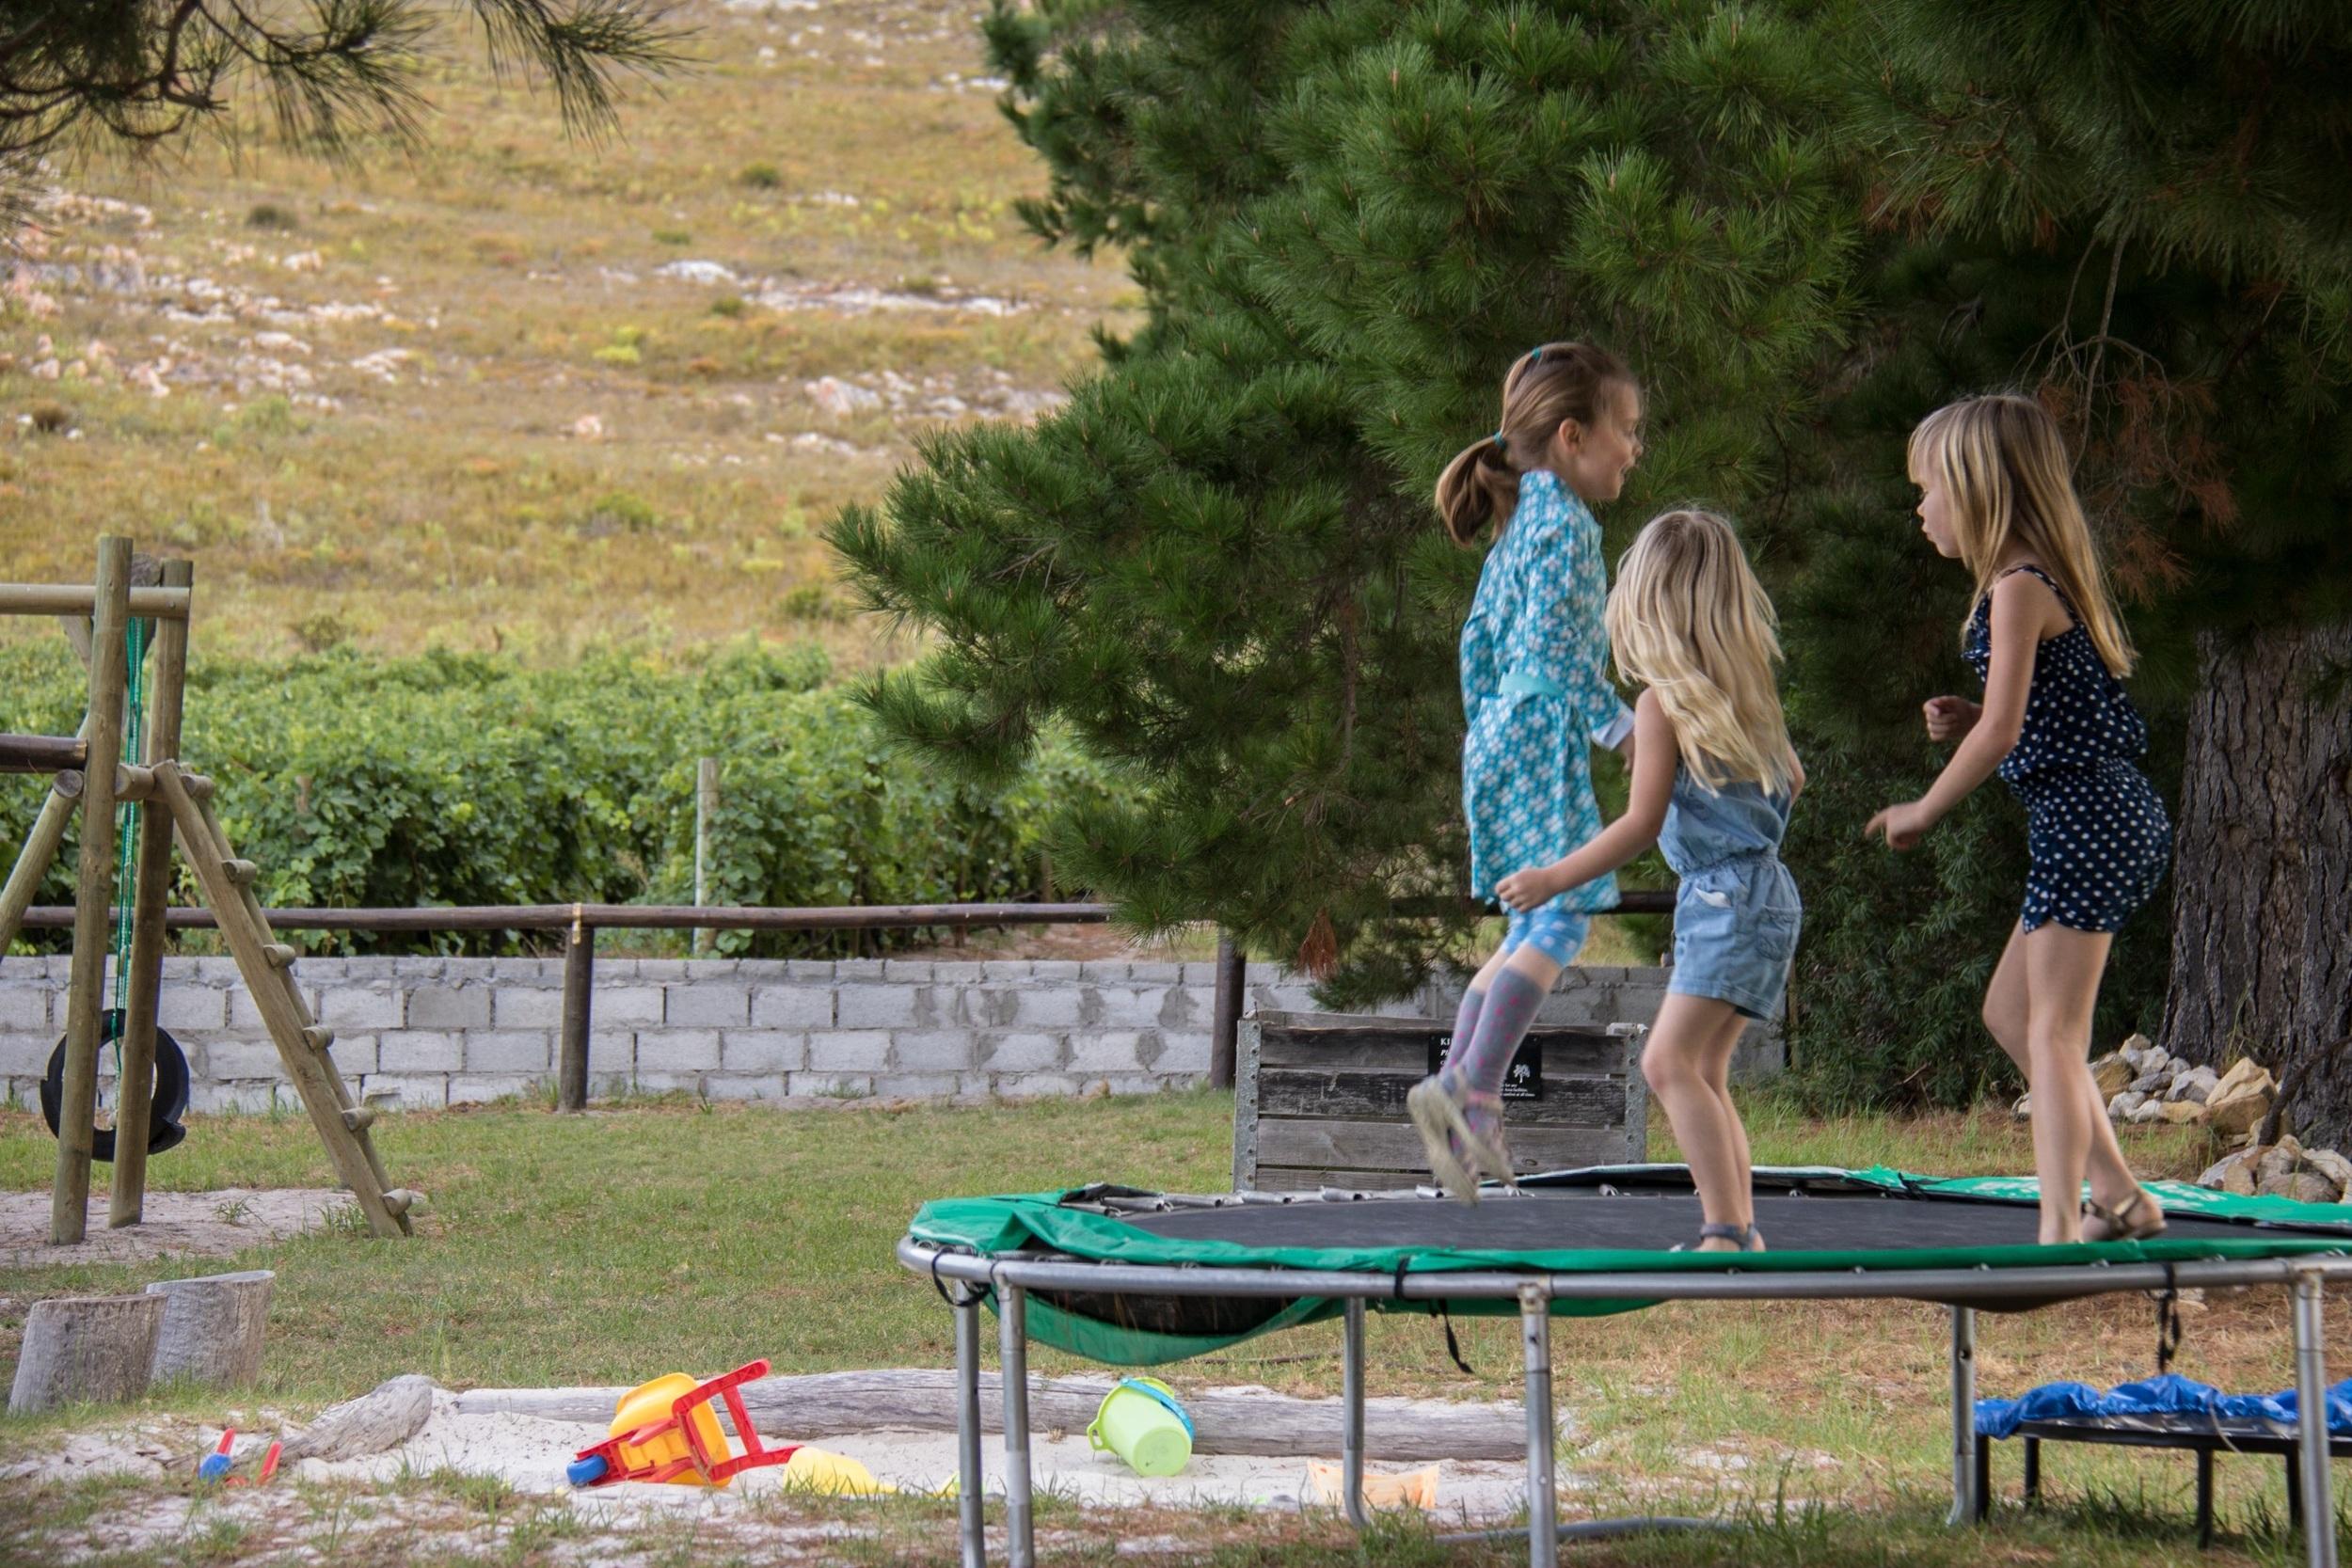 Playground at Blue gum